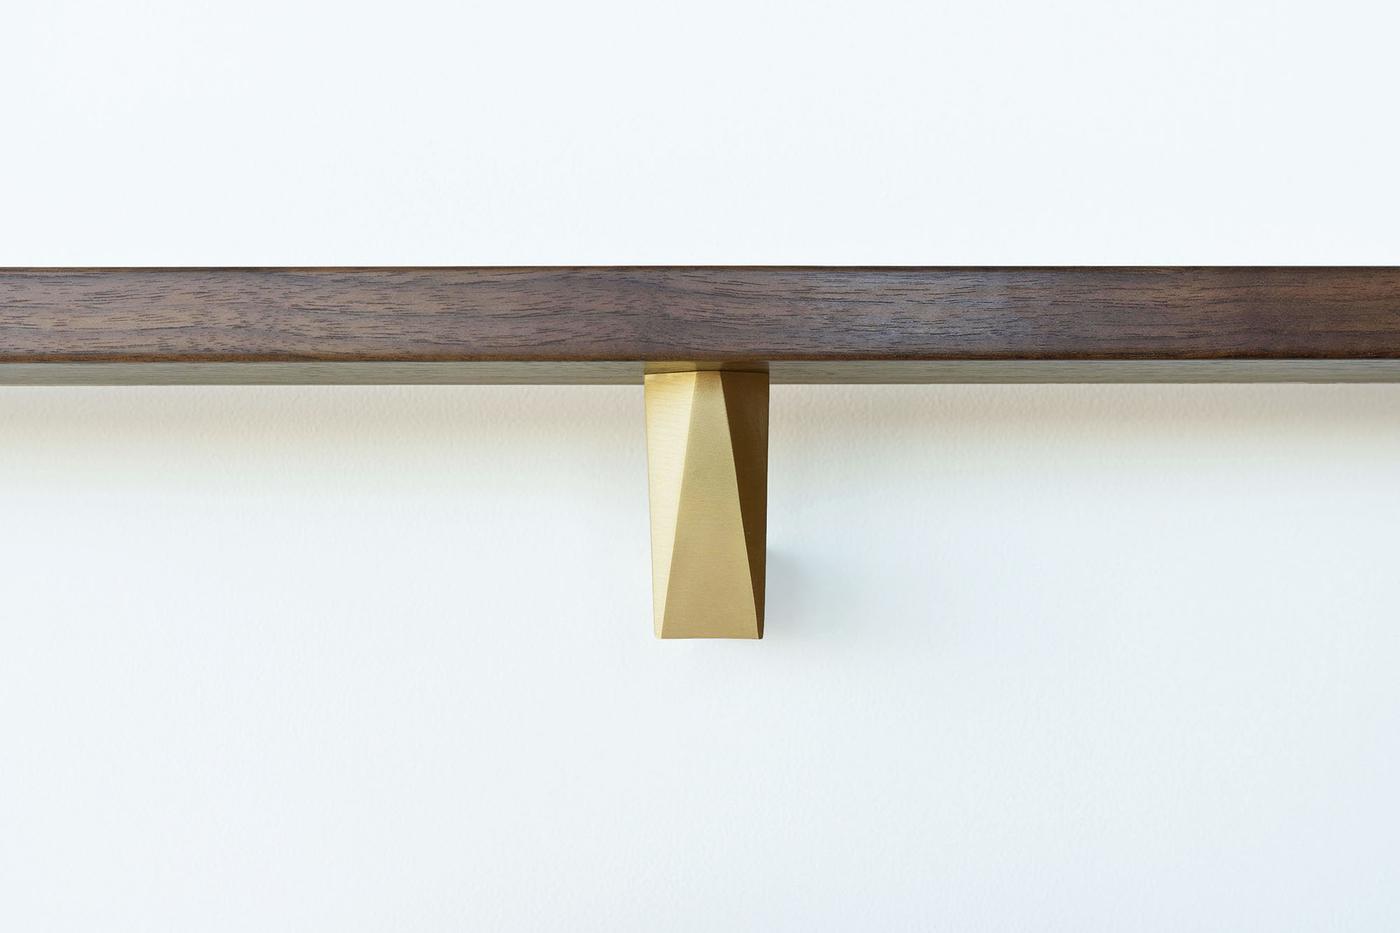 Modern-brushed-brass-handrail-bracket